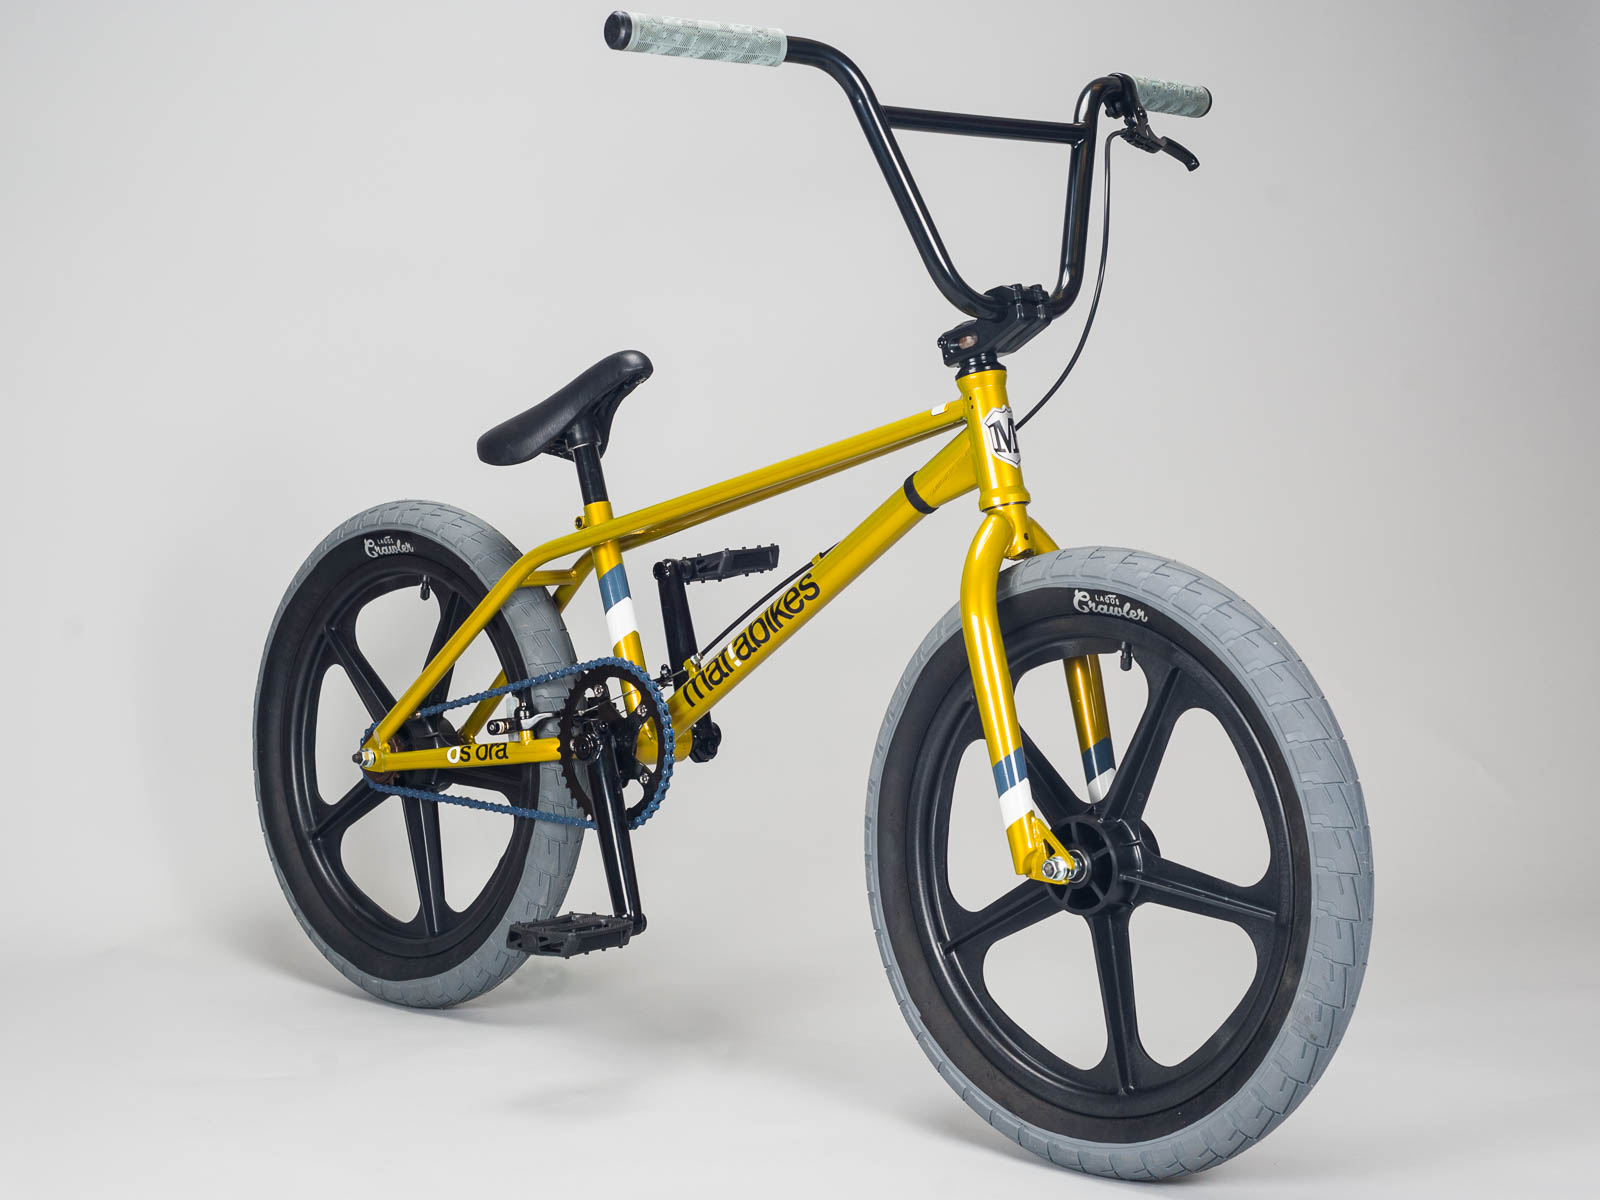 Mafiabikes Os Old School 20 Inch Bmx Bike Multiple Colours